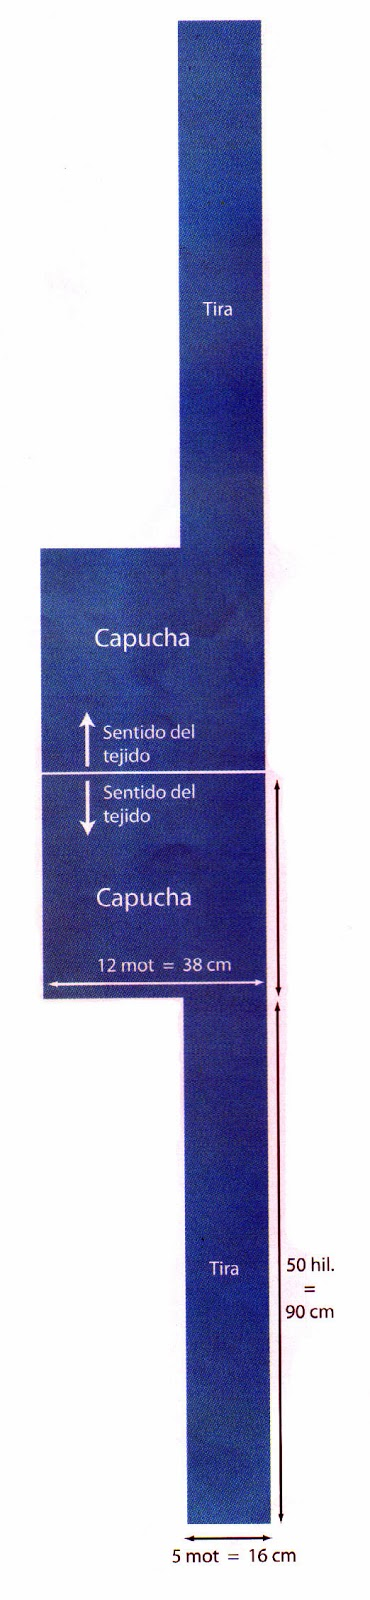 capucha con bufanda crochet-patron-otakulandia.es (4)